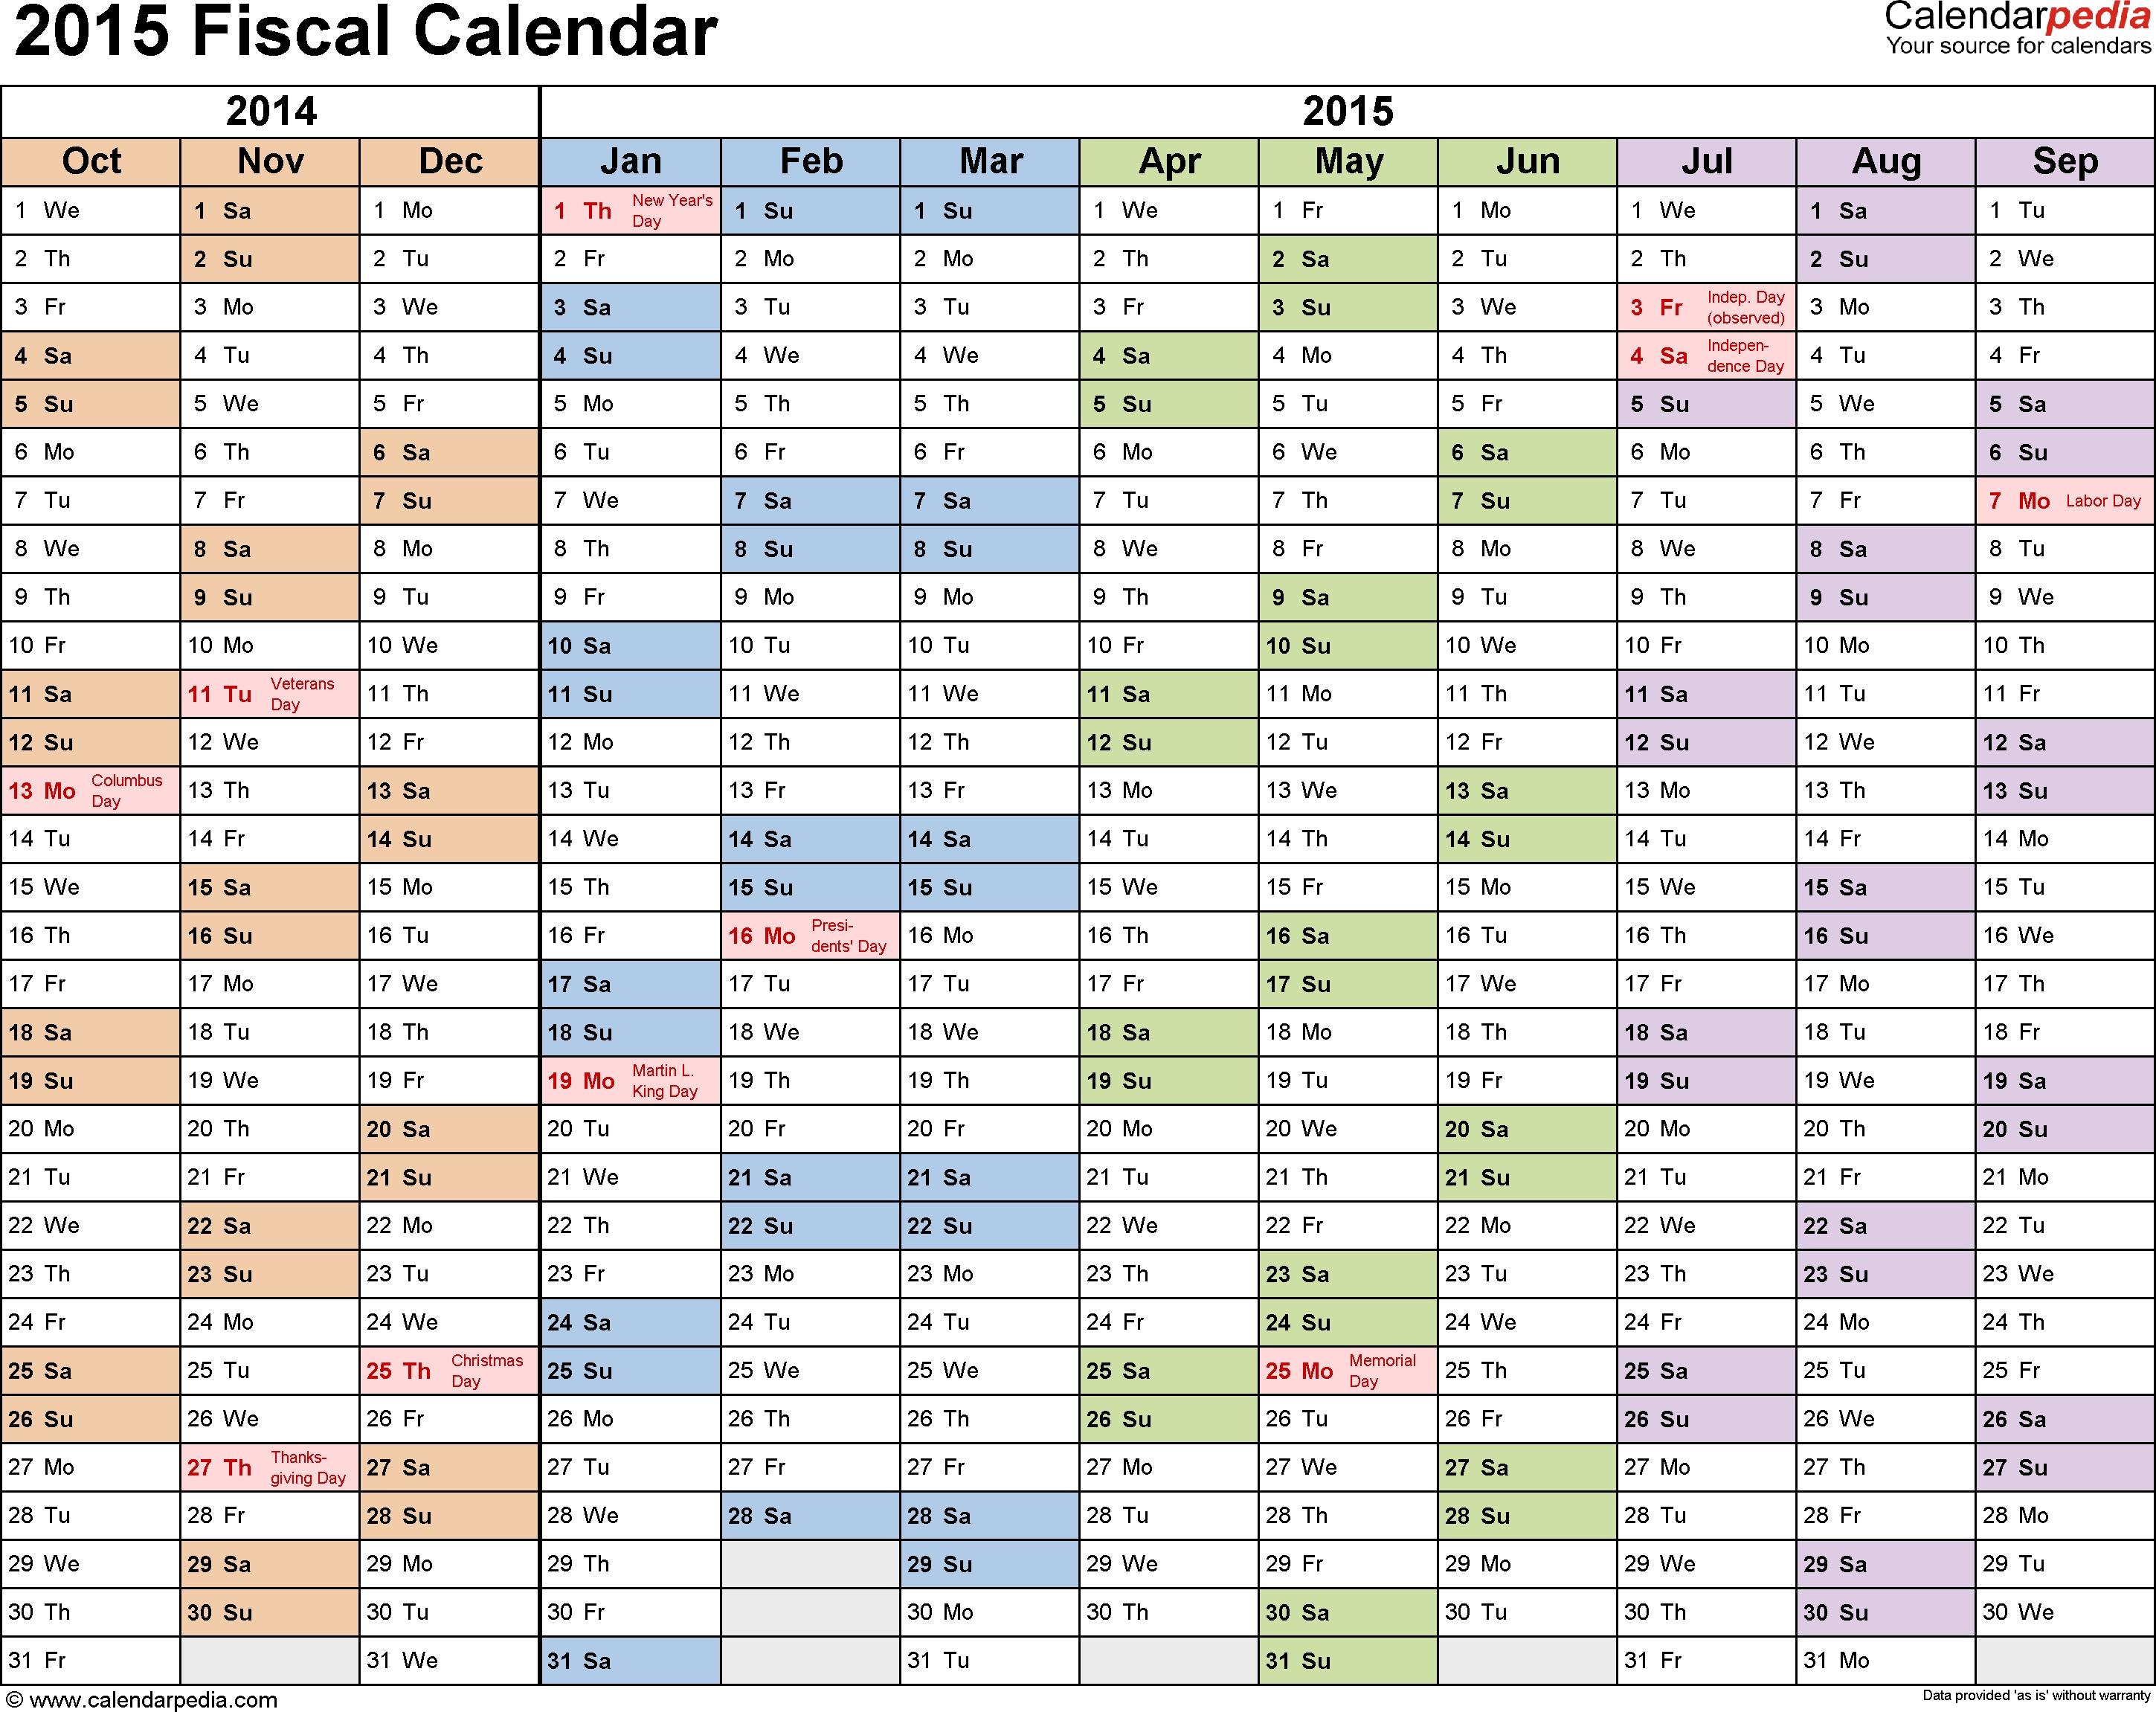 Fiscal Calendars 2015 - Free Printable Pdf Templates